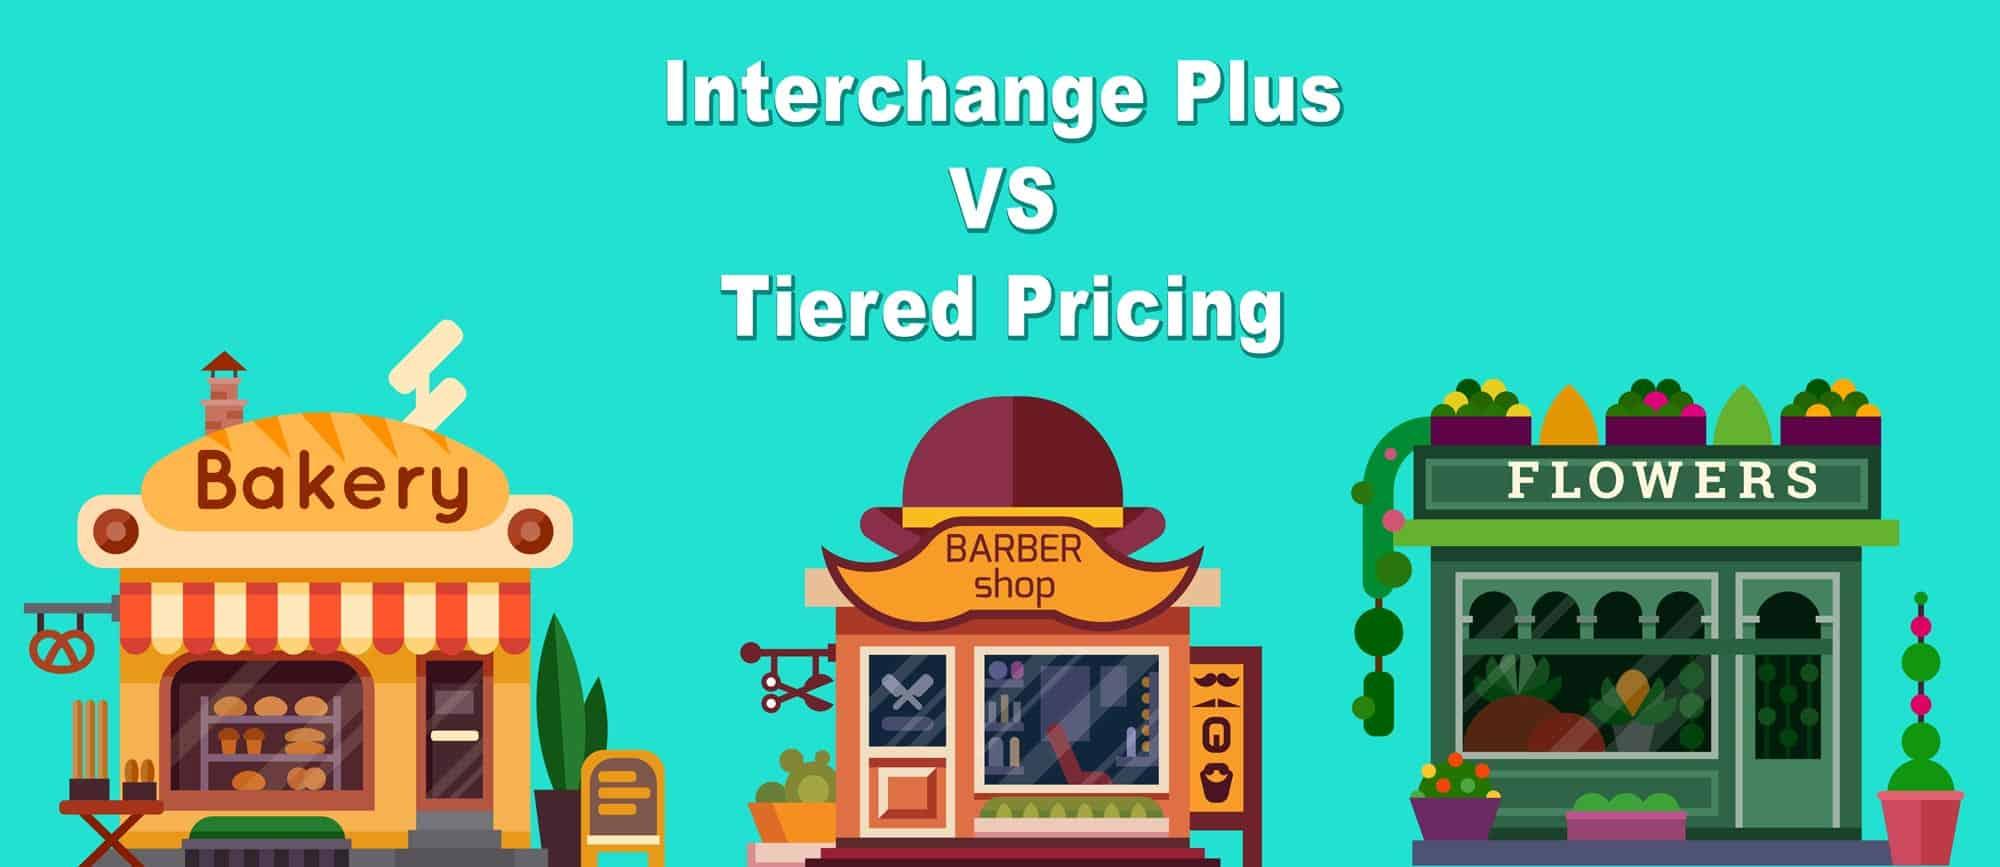 Interchange Plus vs Tiered Pricing